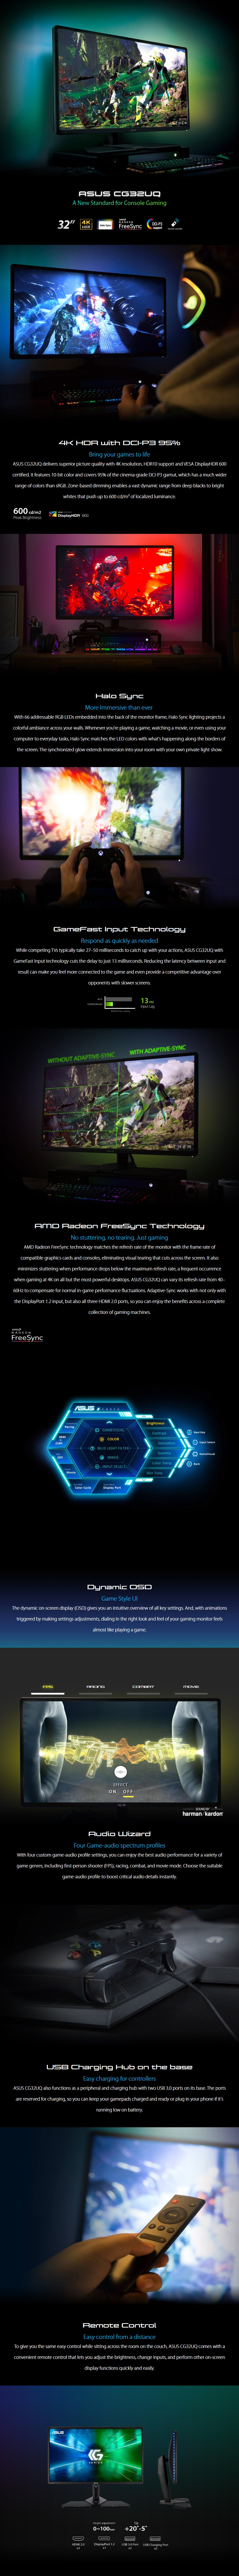 asus-cg32uq-32-4k-dcip3-95-hdr-freesync-console-gaming-monitor-ac27424-6.jpg